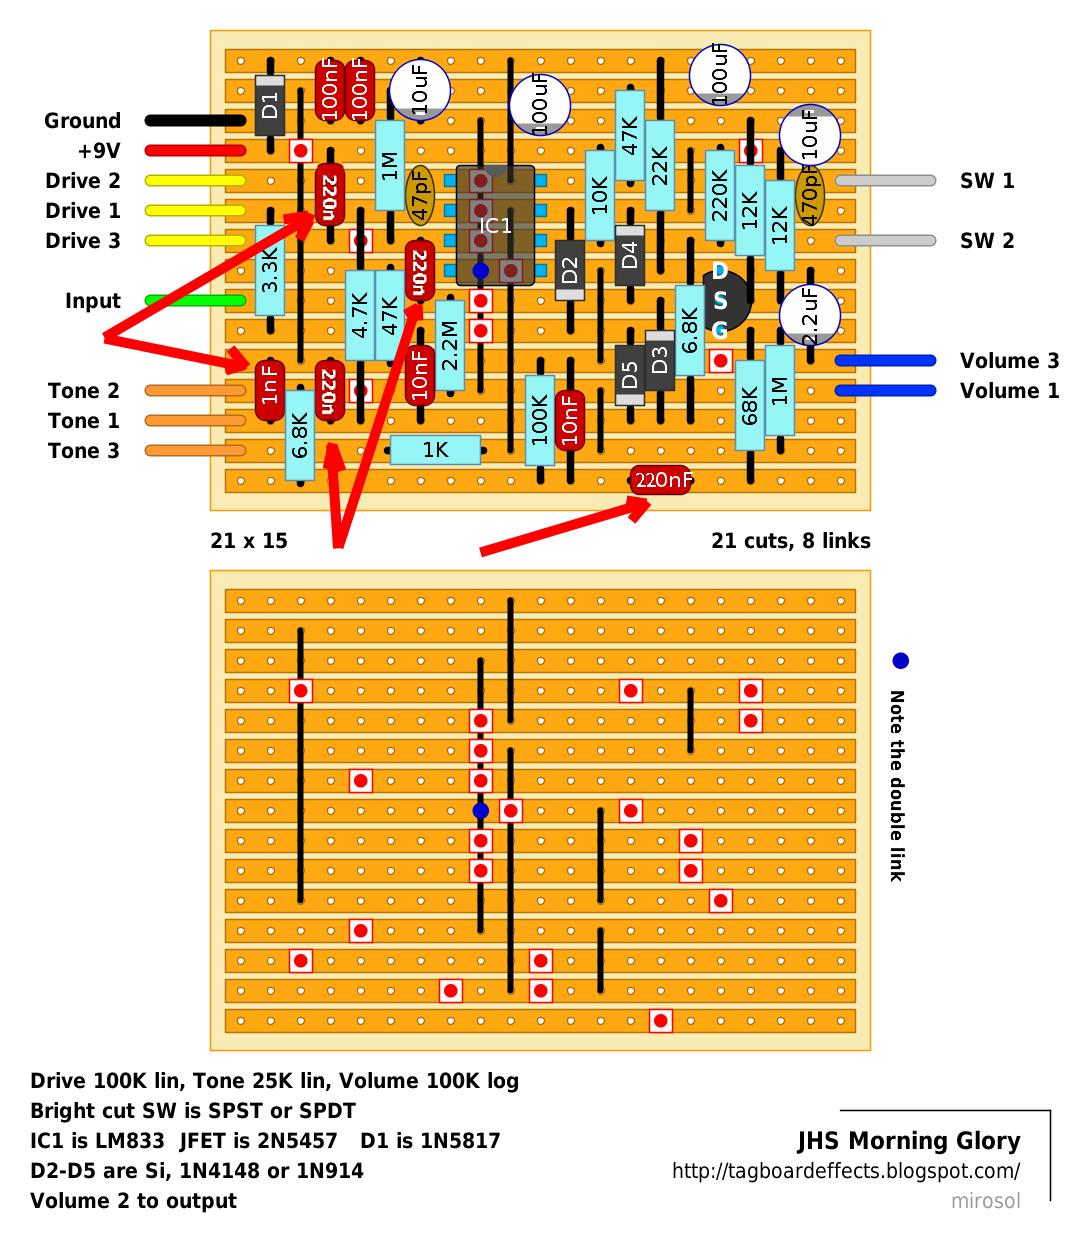 95 oldsmobile cutl supreme engine diagram chevelle engine